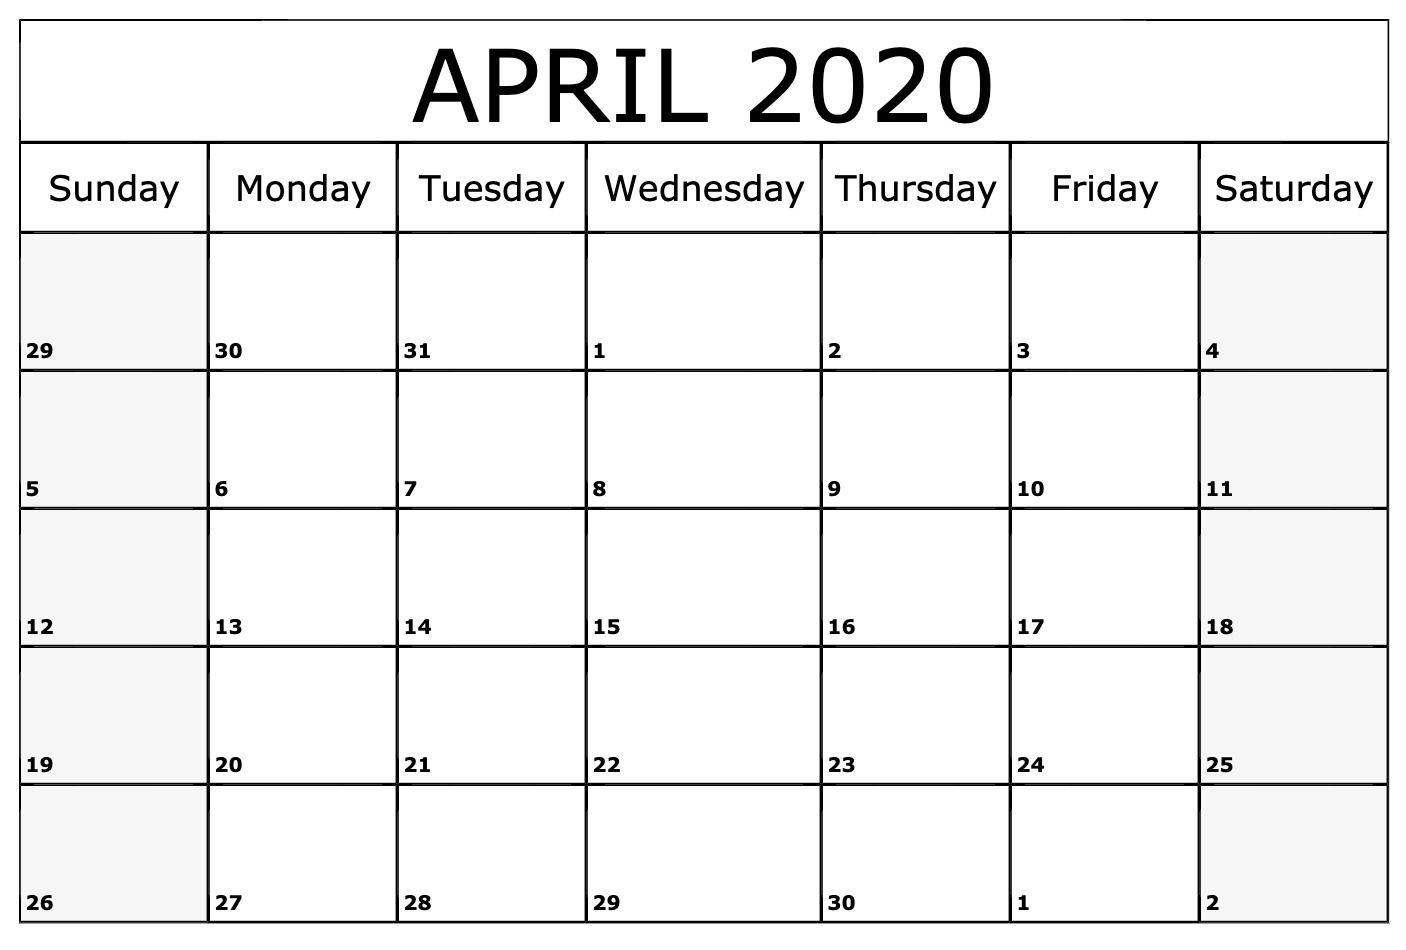 Monthly 2020 April Calendar